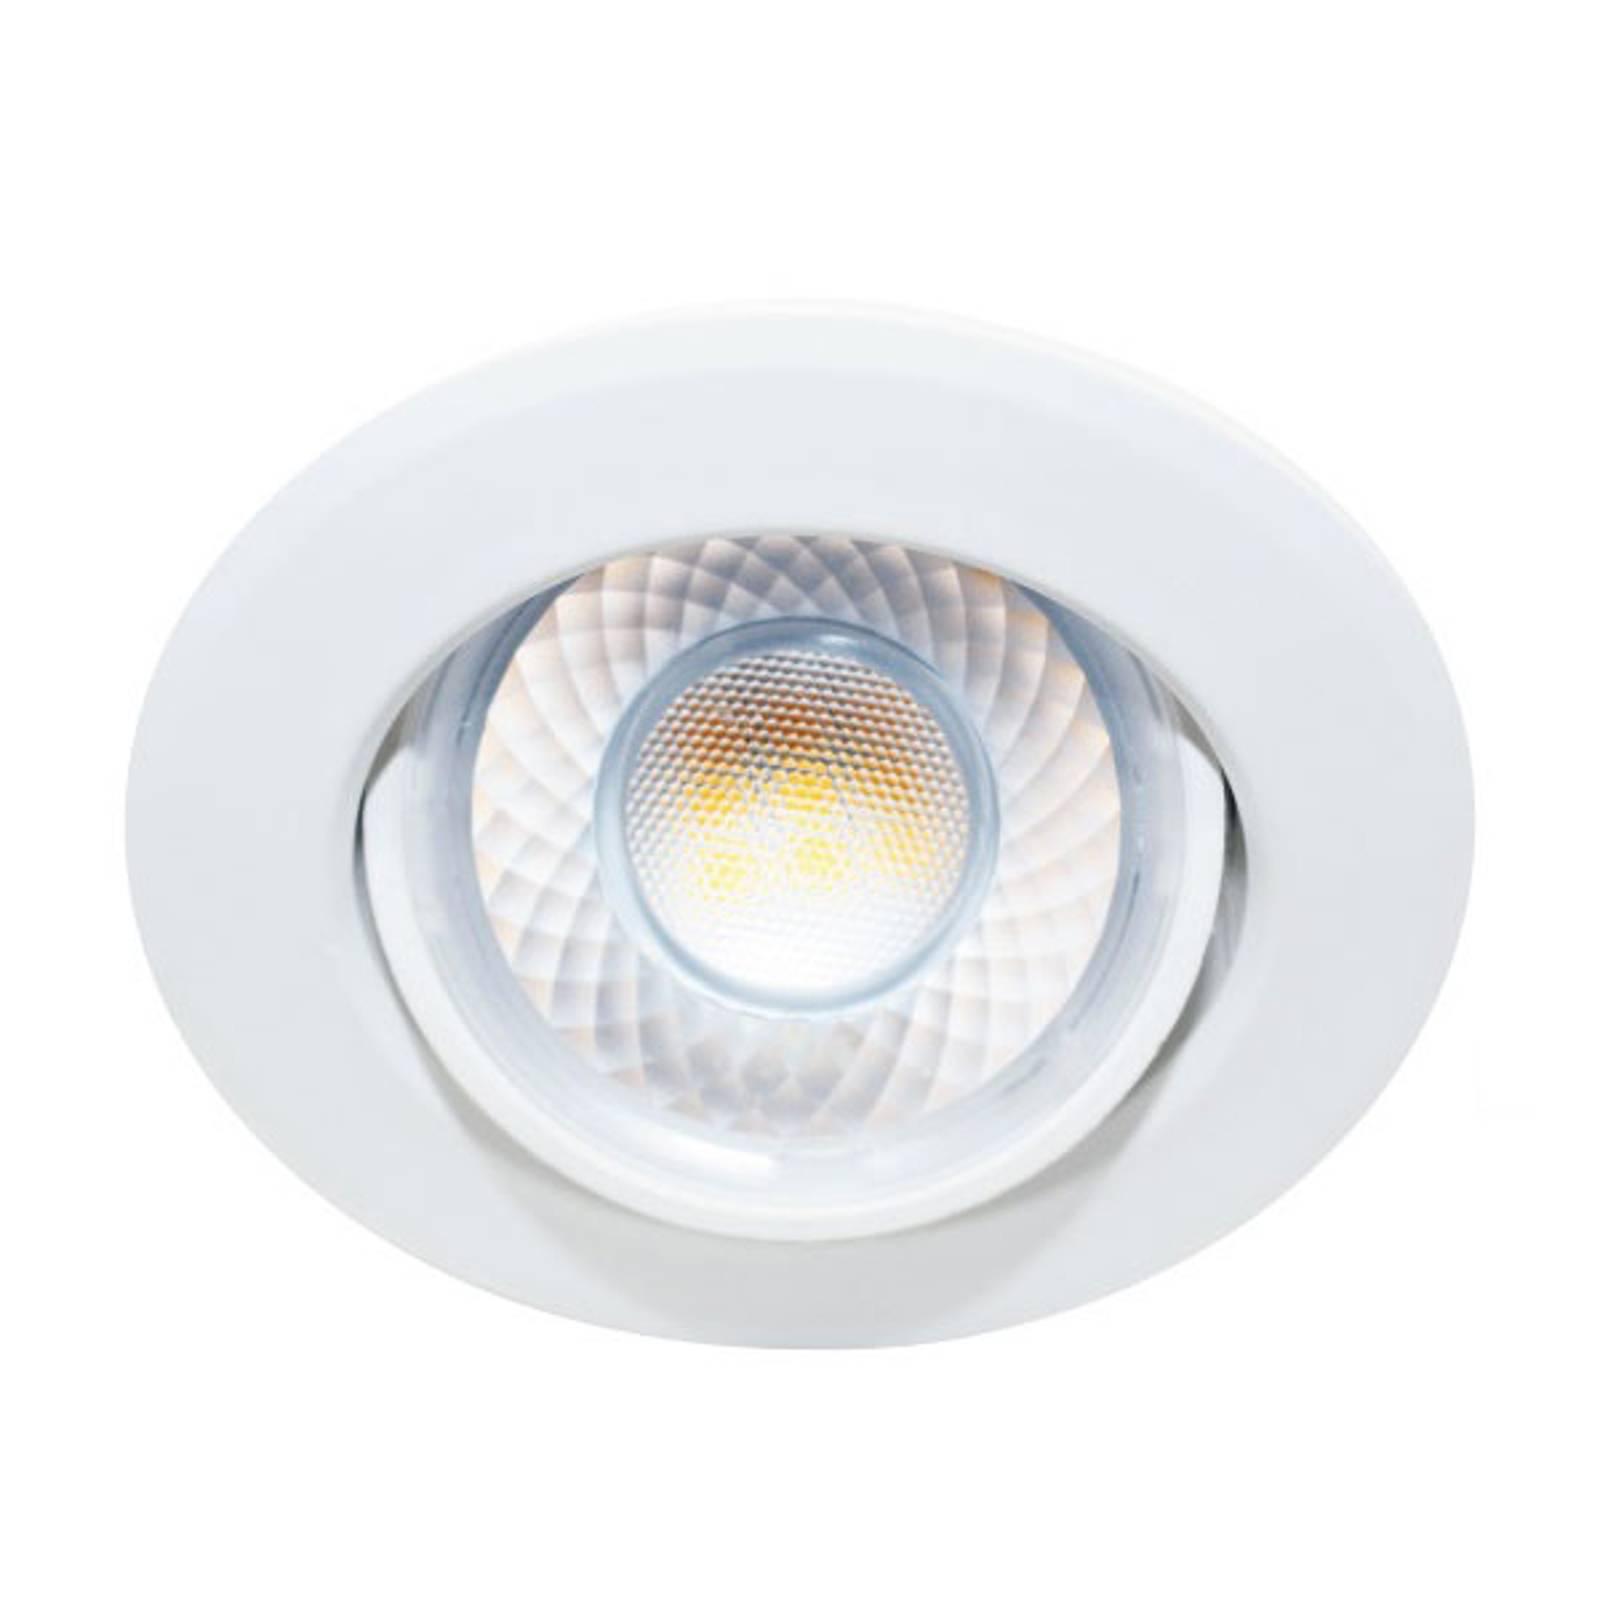 LED-uppokohdevalo Dekto 7,8cm 38° 8W Ra90 2700K